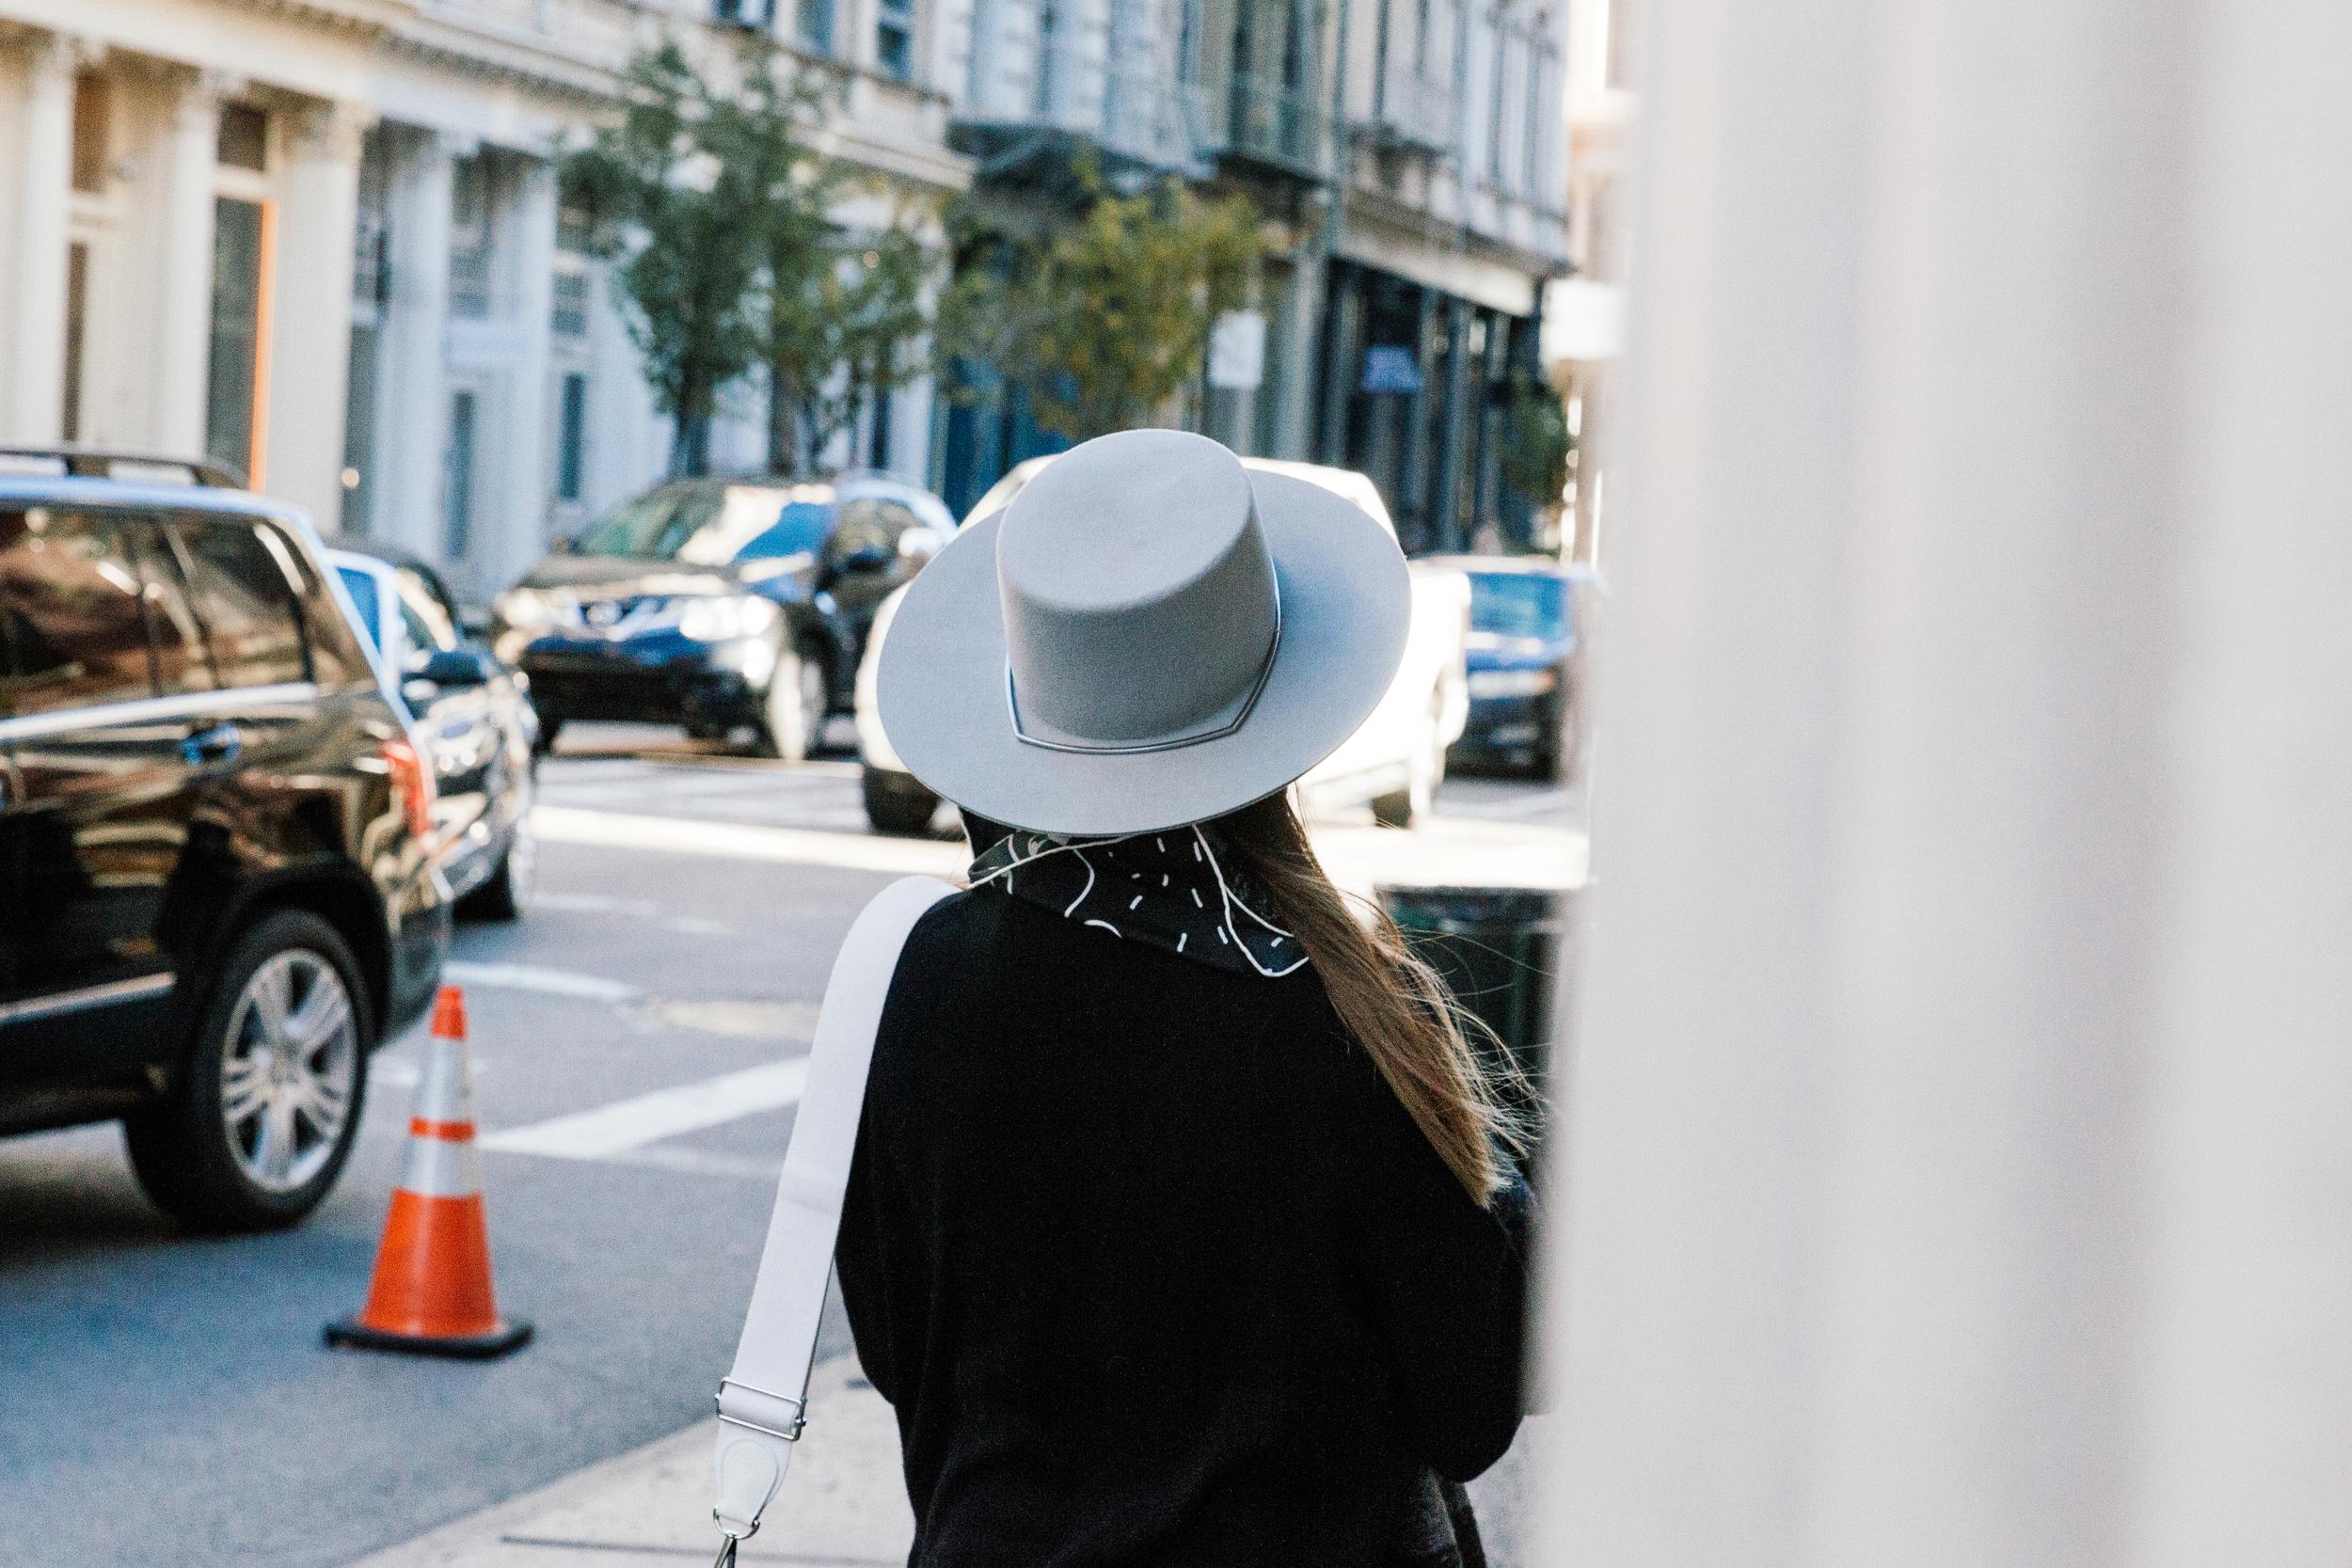 Hermes Bag ,  Isabel Marant Coat ,  Everlane Sweater ,  Rag & Bone Pants ,  Adidas Sneakers ,  Gentle Monster Sunglasses ,  Janessa Leone Hat ,  The Slow Factory Scarf